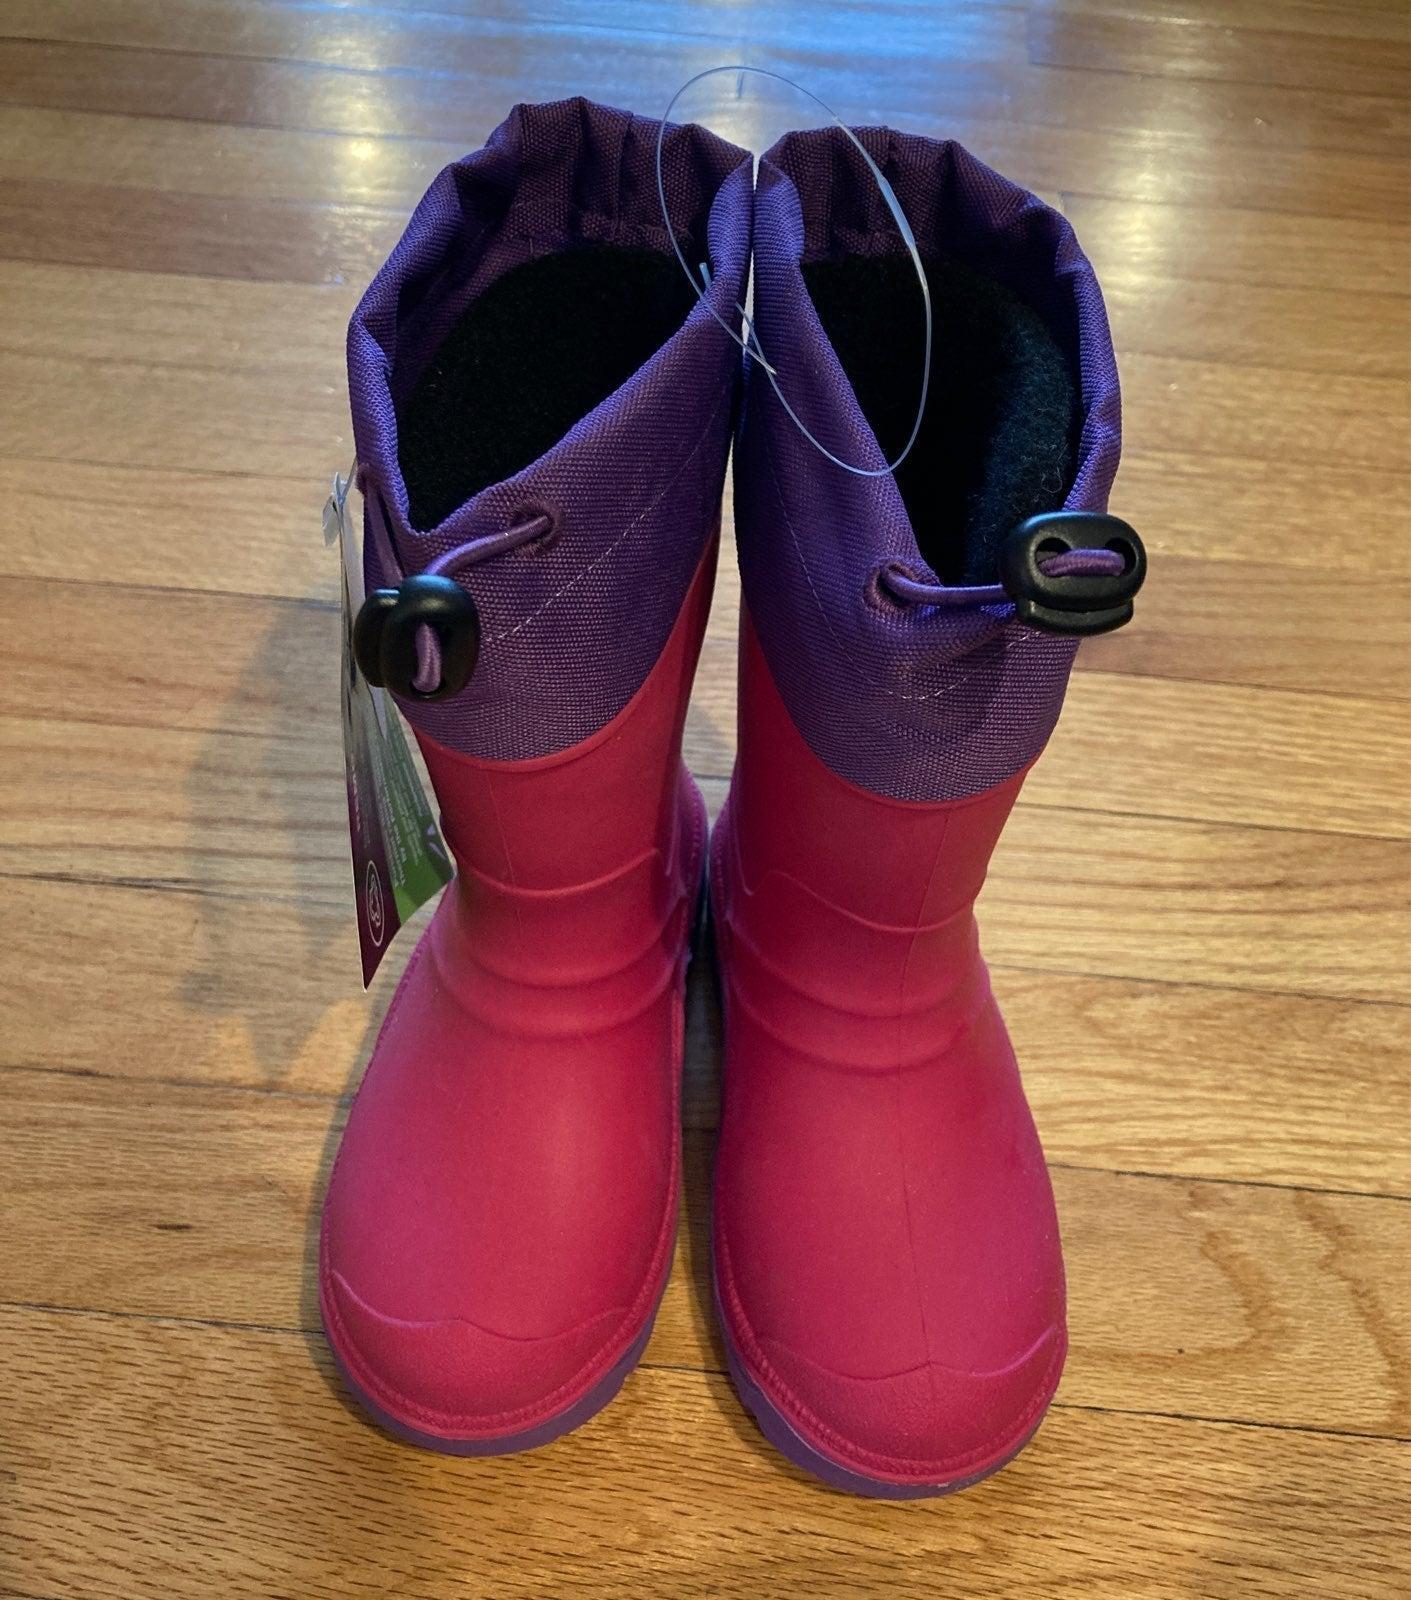 Size 9 Girls Waterproof snow boots